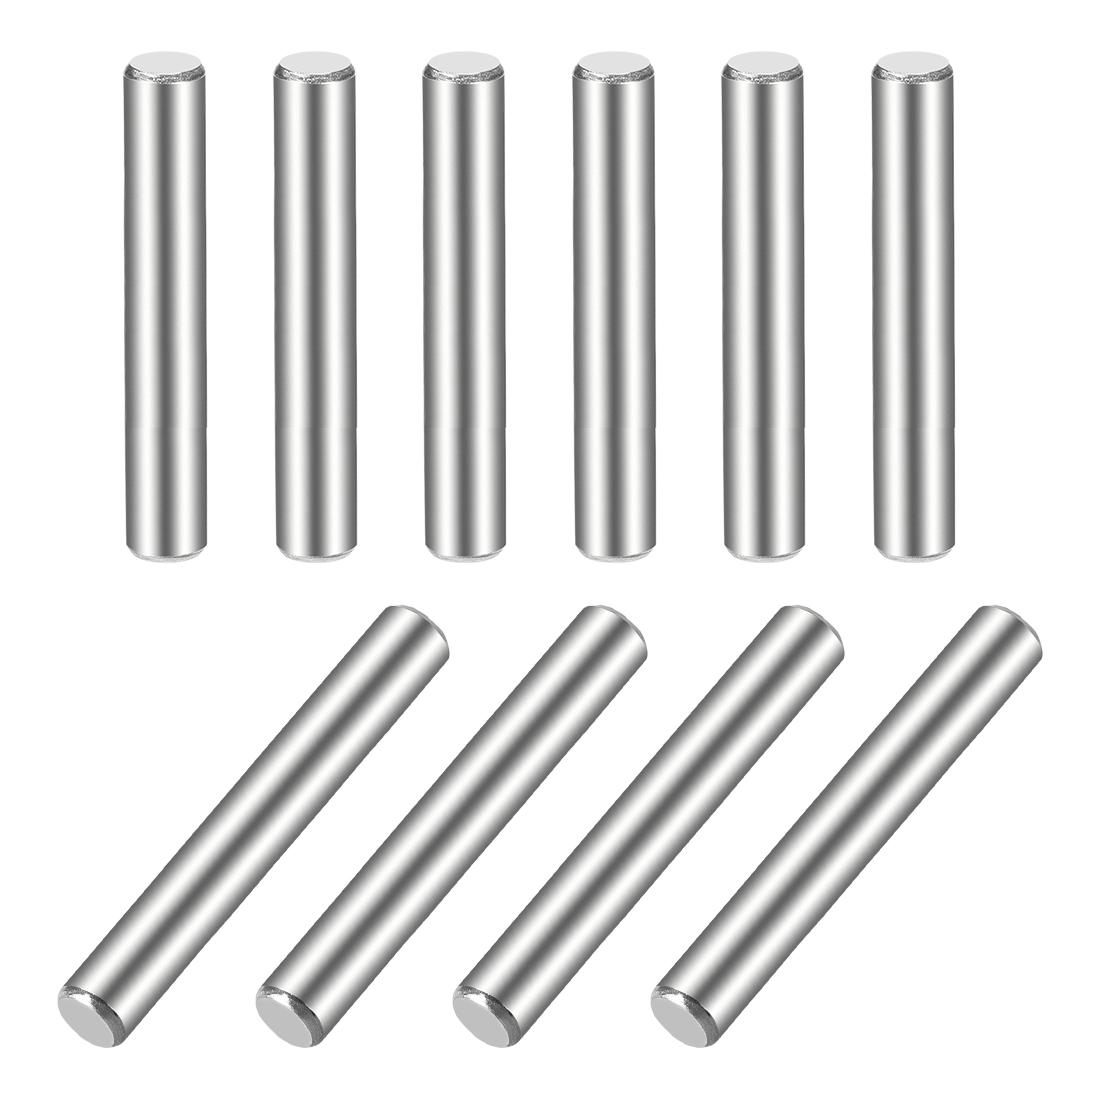 10Pcs 5mm x 45mm Dowel Pin 304 Stainless Steel Shelf Support Pin Fasten